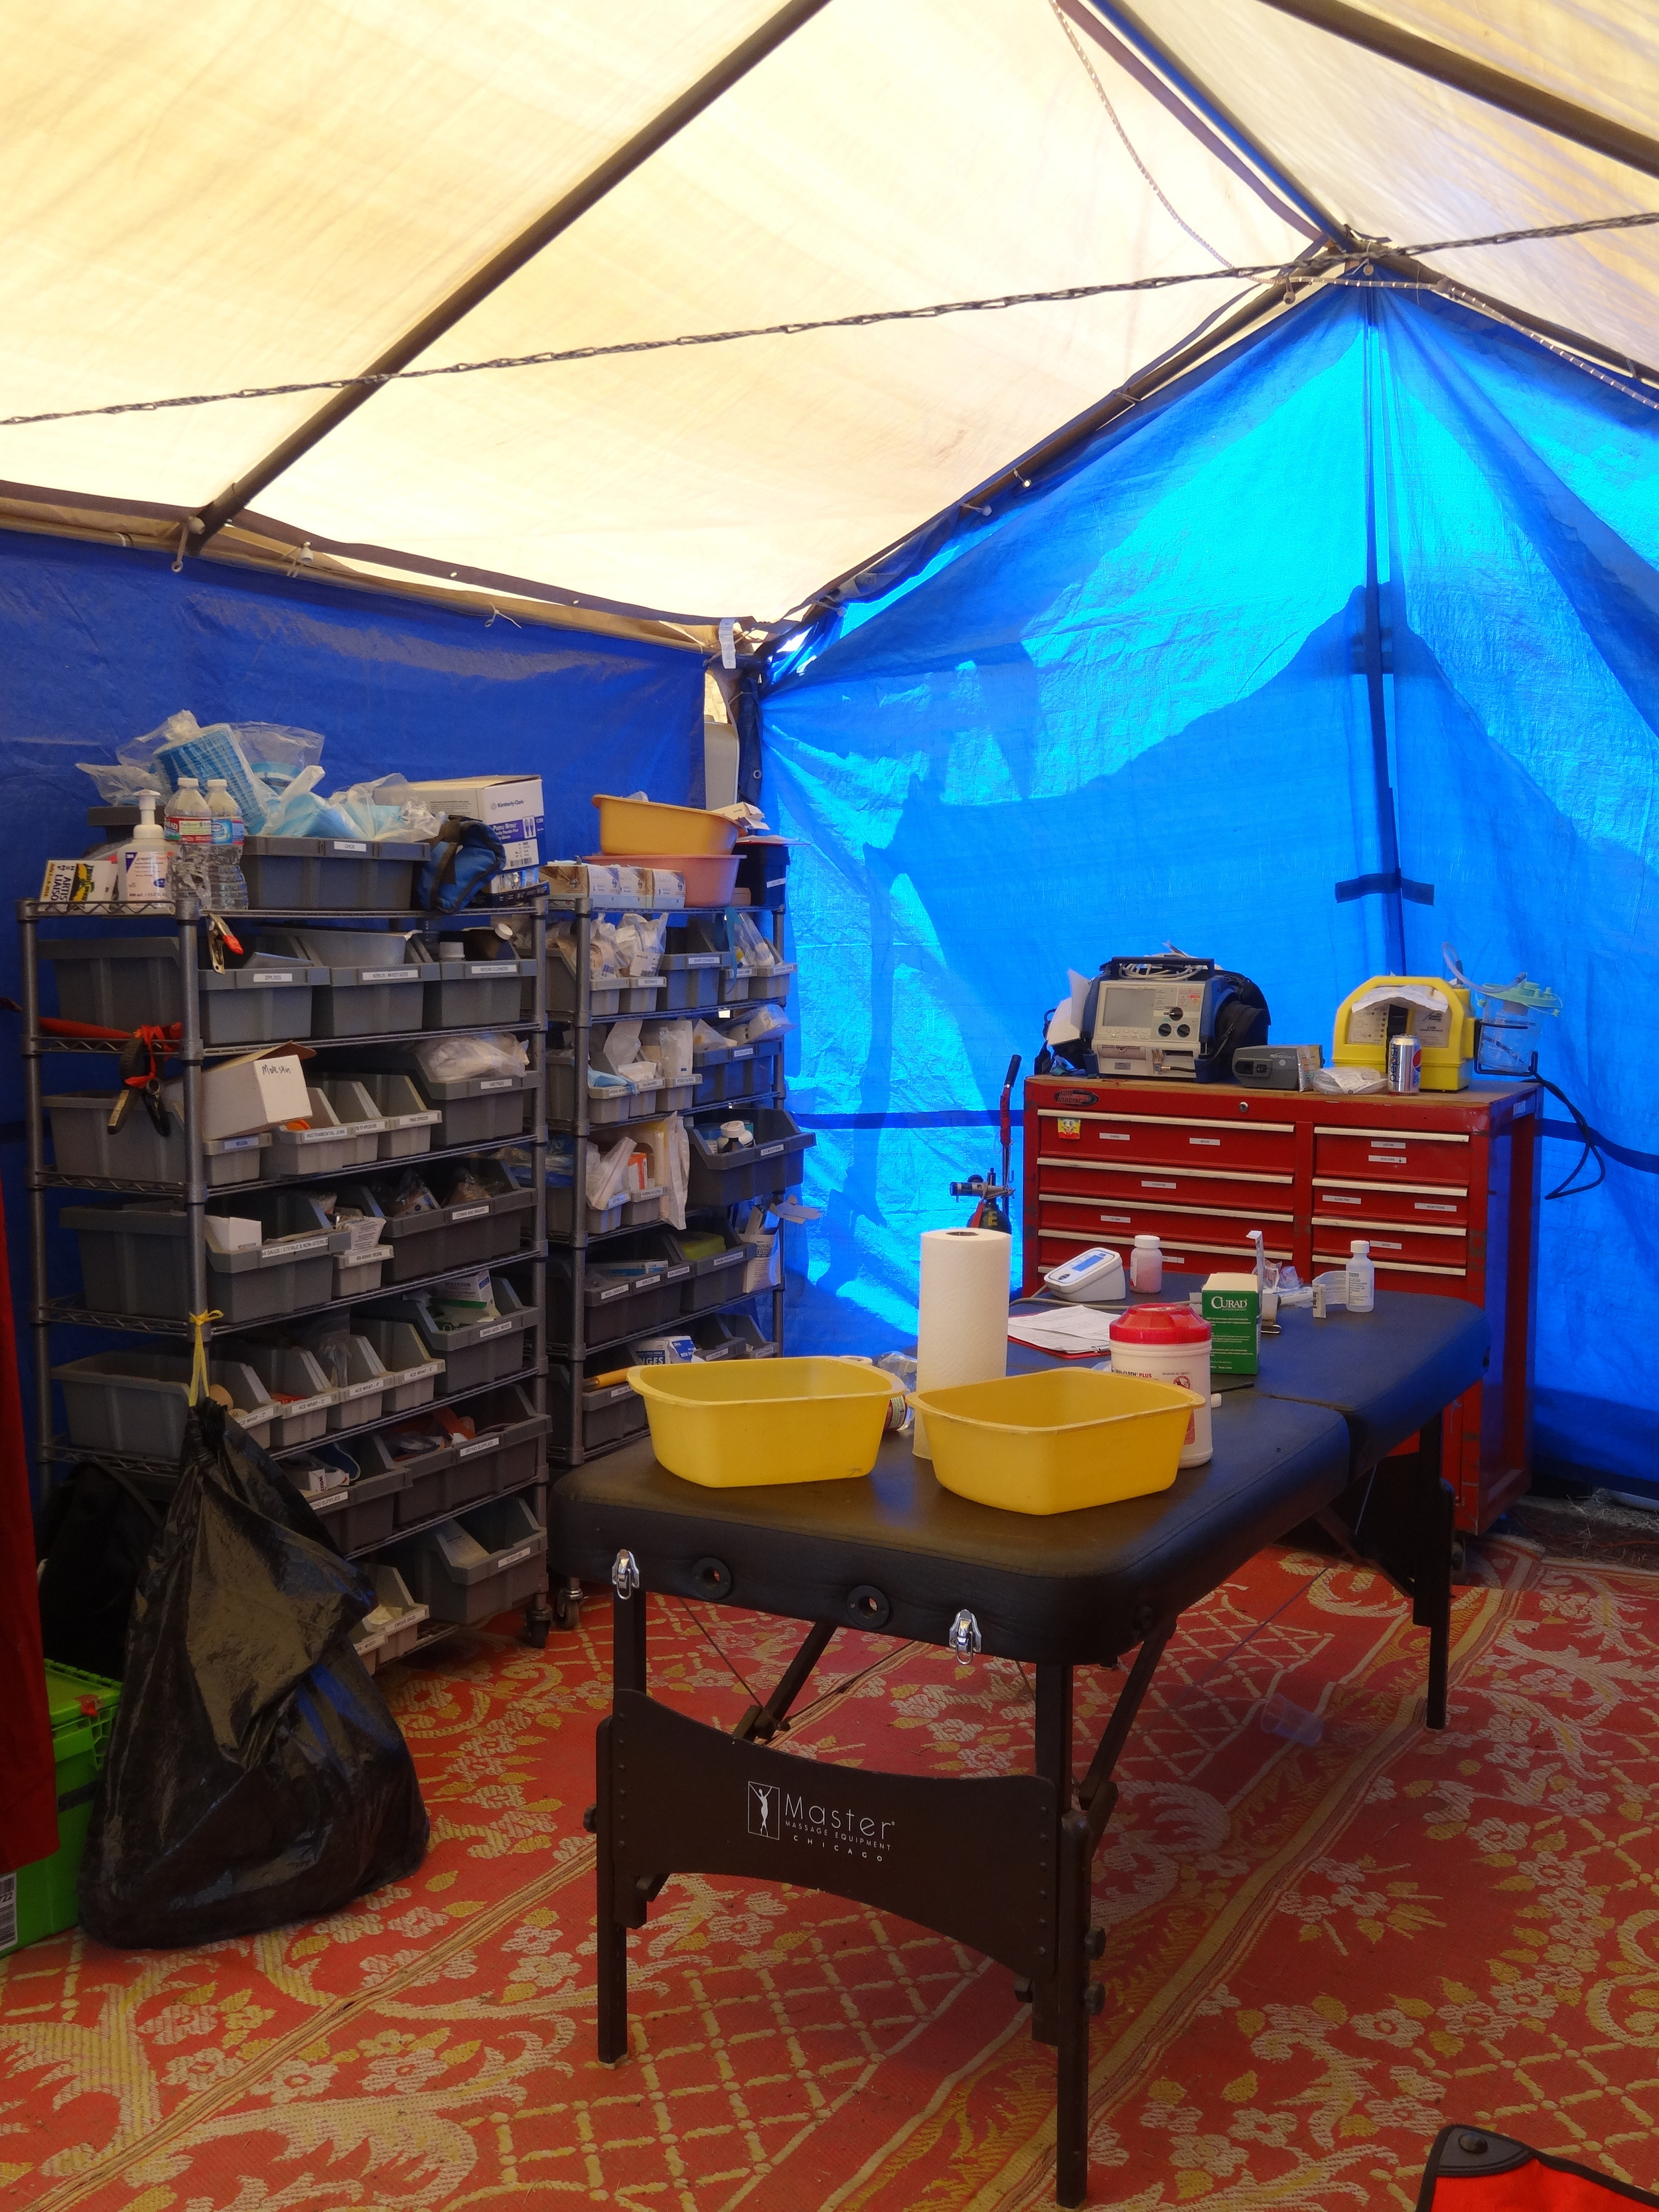 Medical facilities at a festival